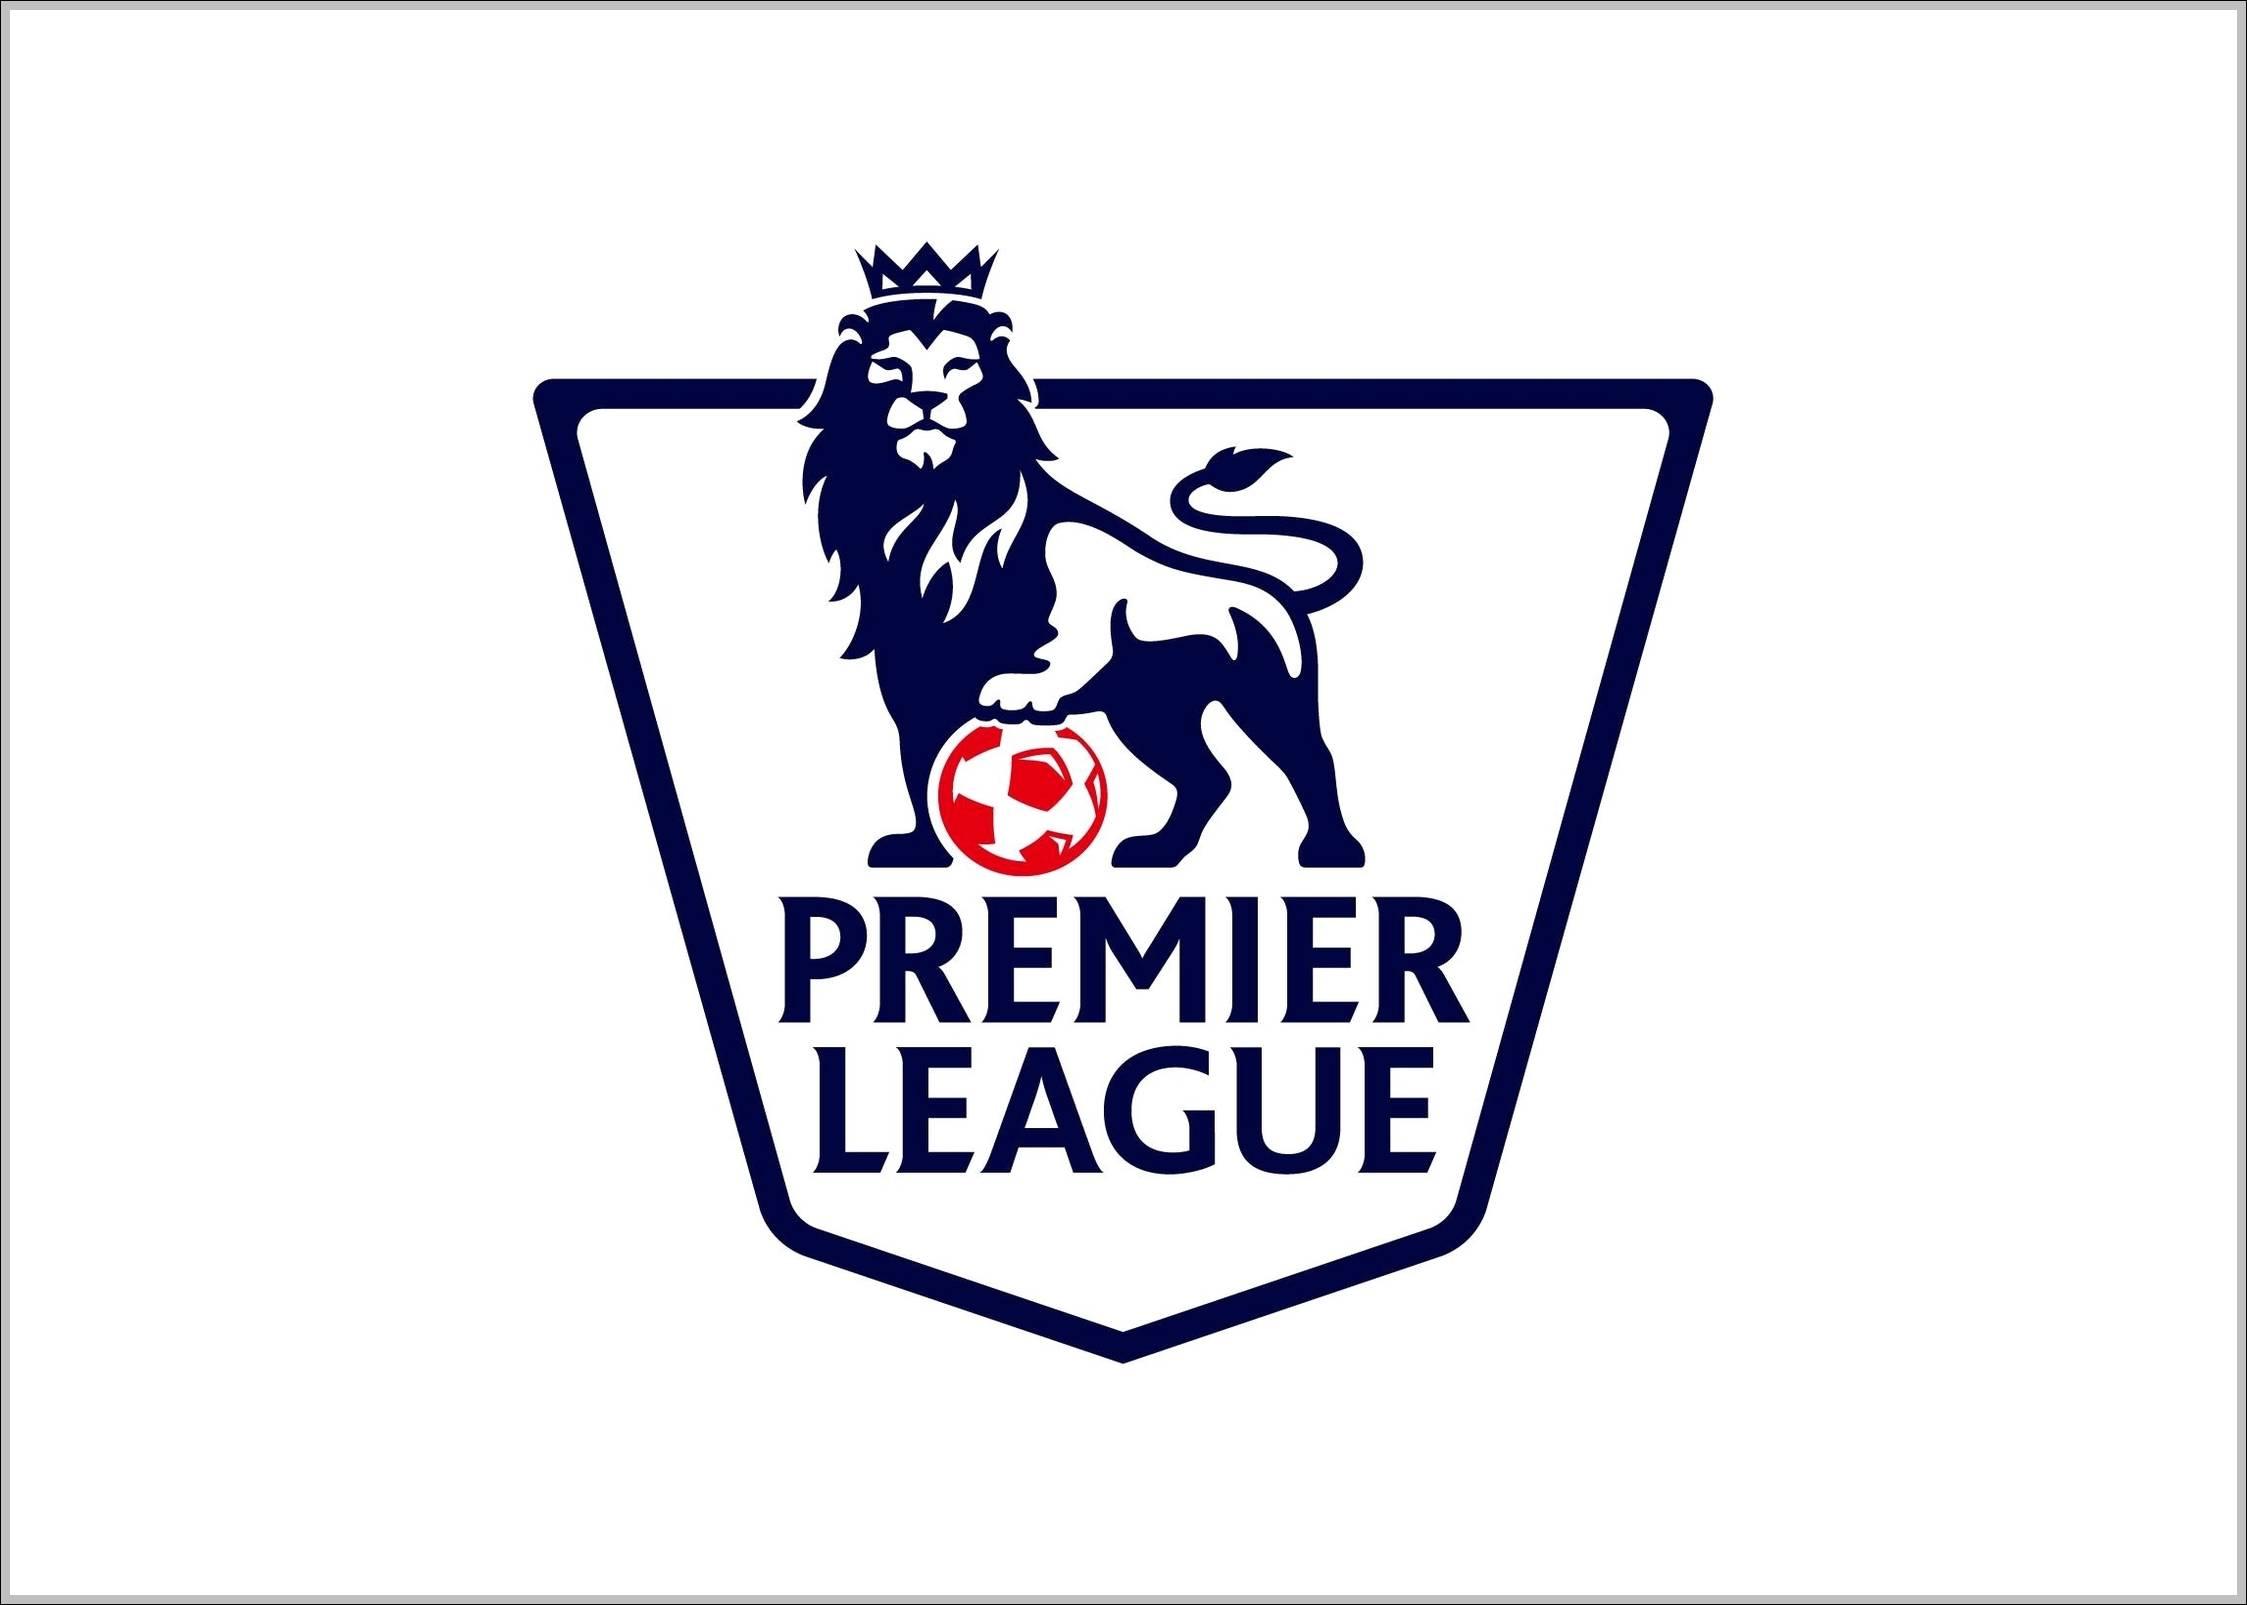 Premier League logo shield